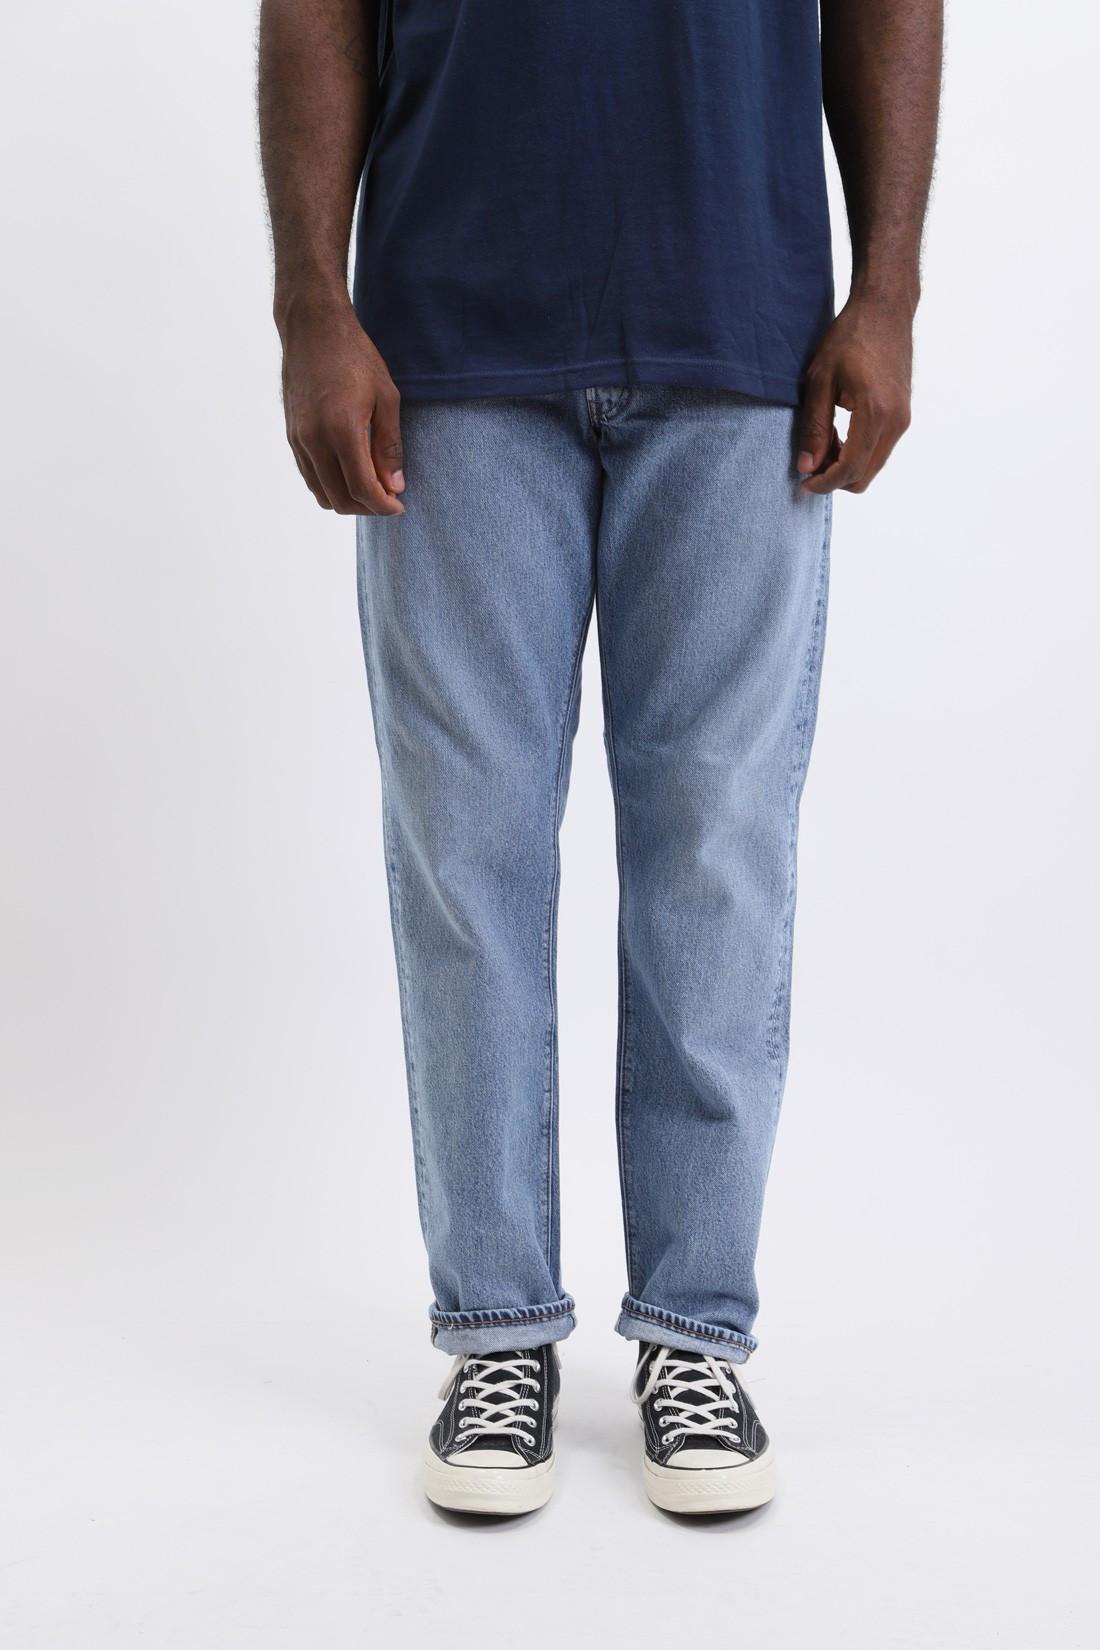 ORSLOW / 2 year wash 105 standard jean Indigo